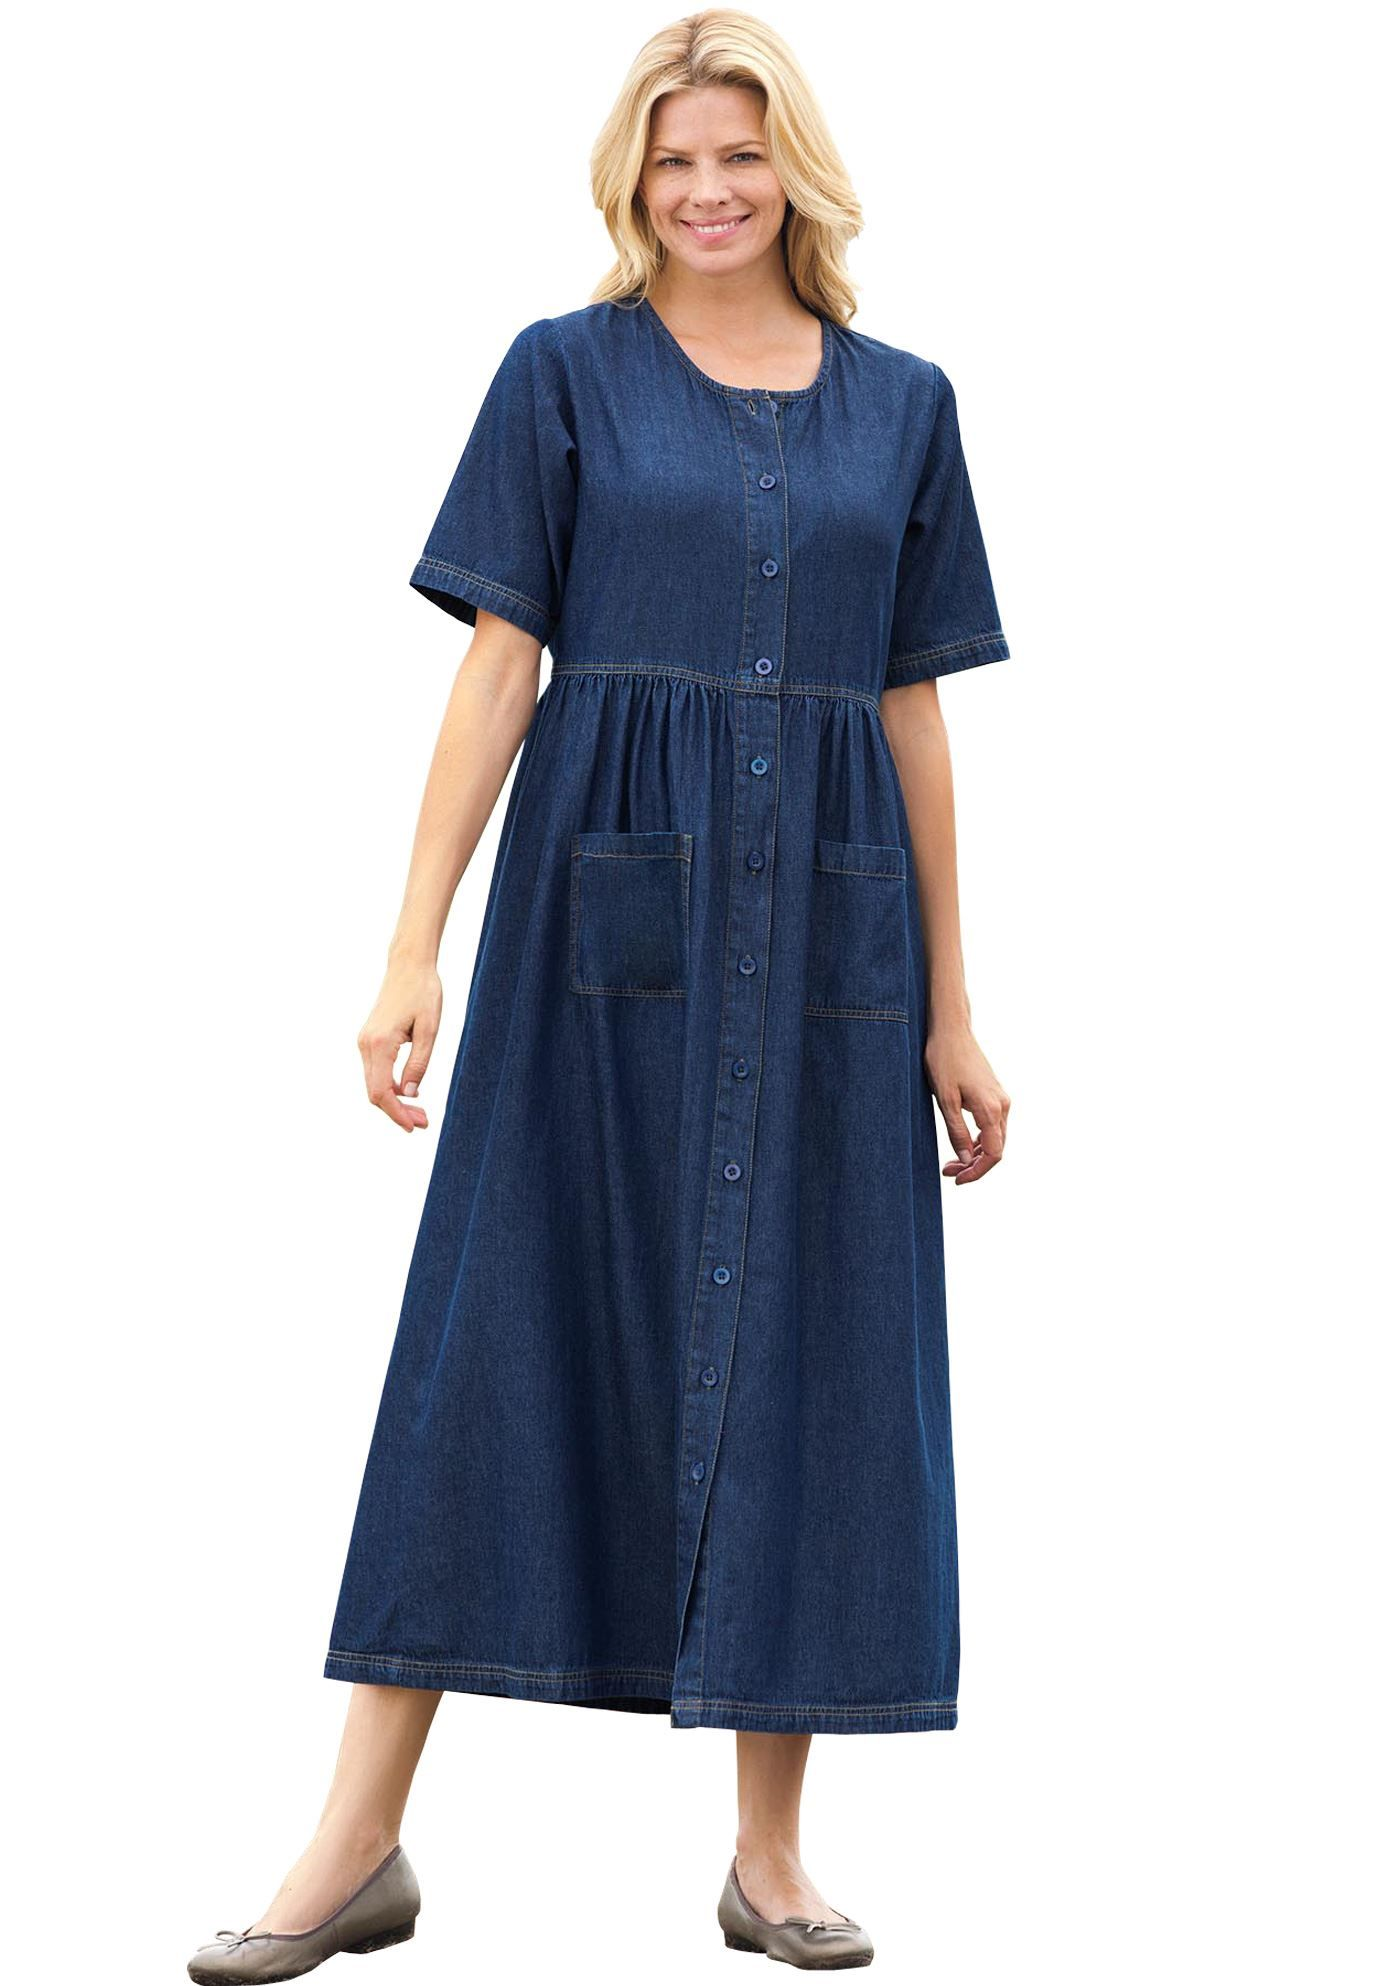 Plus Size Petite empire waist denim dress | fashon / design ...